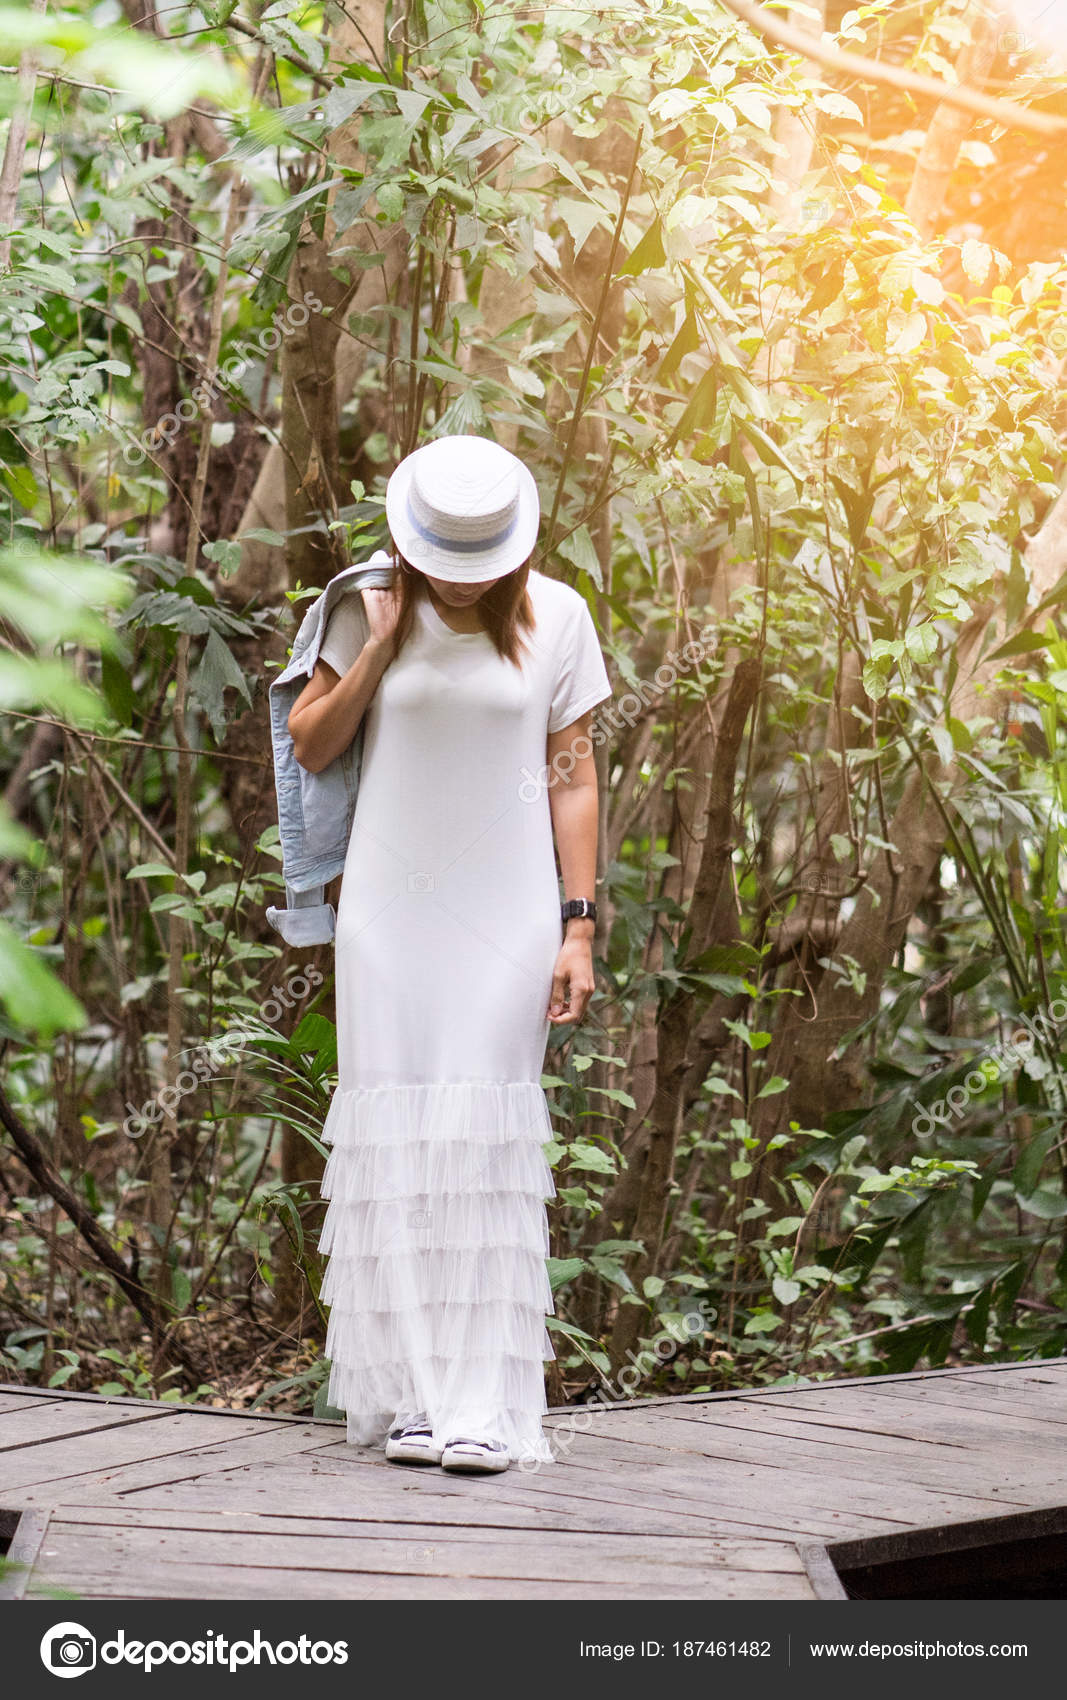 377b754d1314 Ευτυχισμένη γυναίκα που φοράει λευκό μακρύ φόρεμα με σακάκι τζιν στο  δημόσιο πάρκο. Έννοια ευτυχισμένη ζωή με τη φύση– εικόνα αρχείου